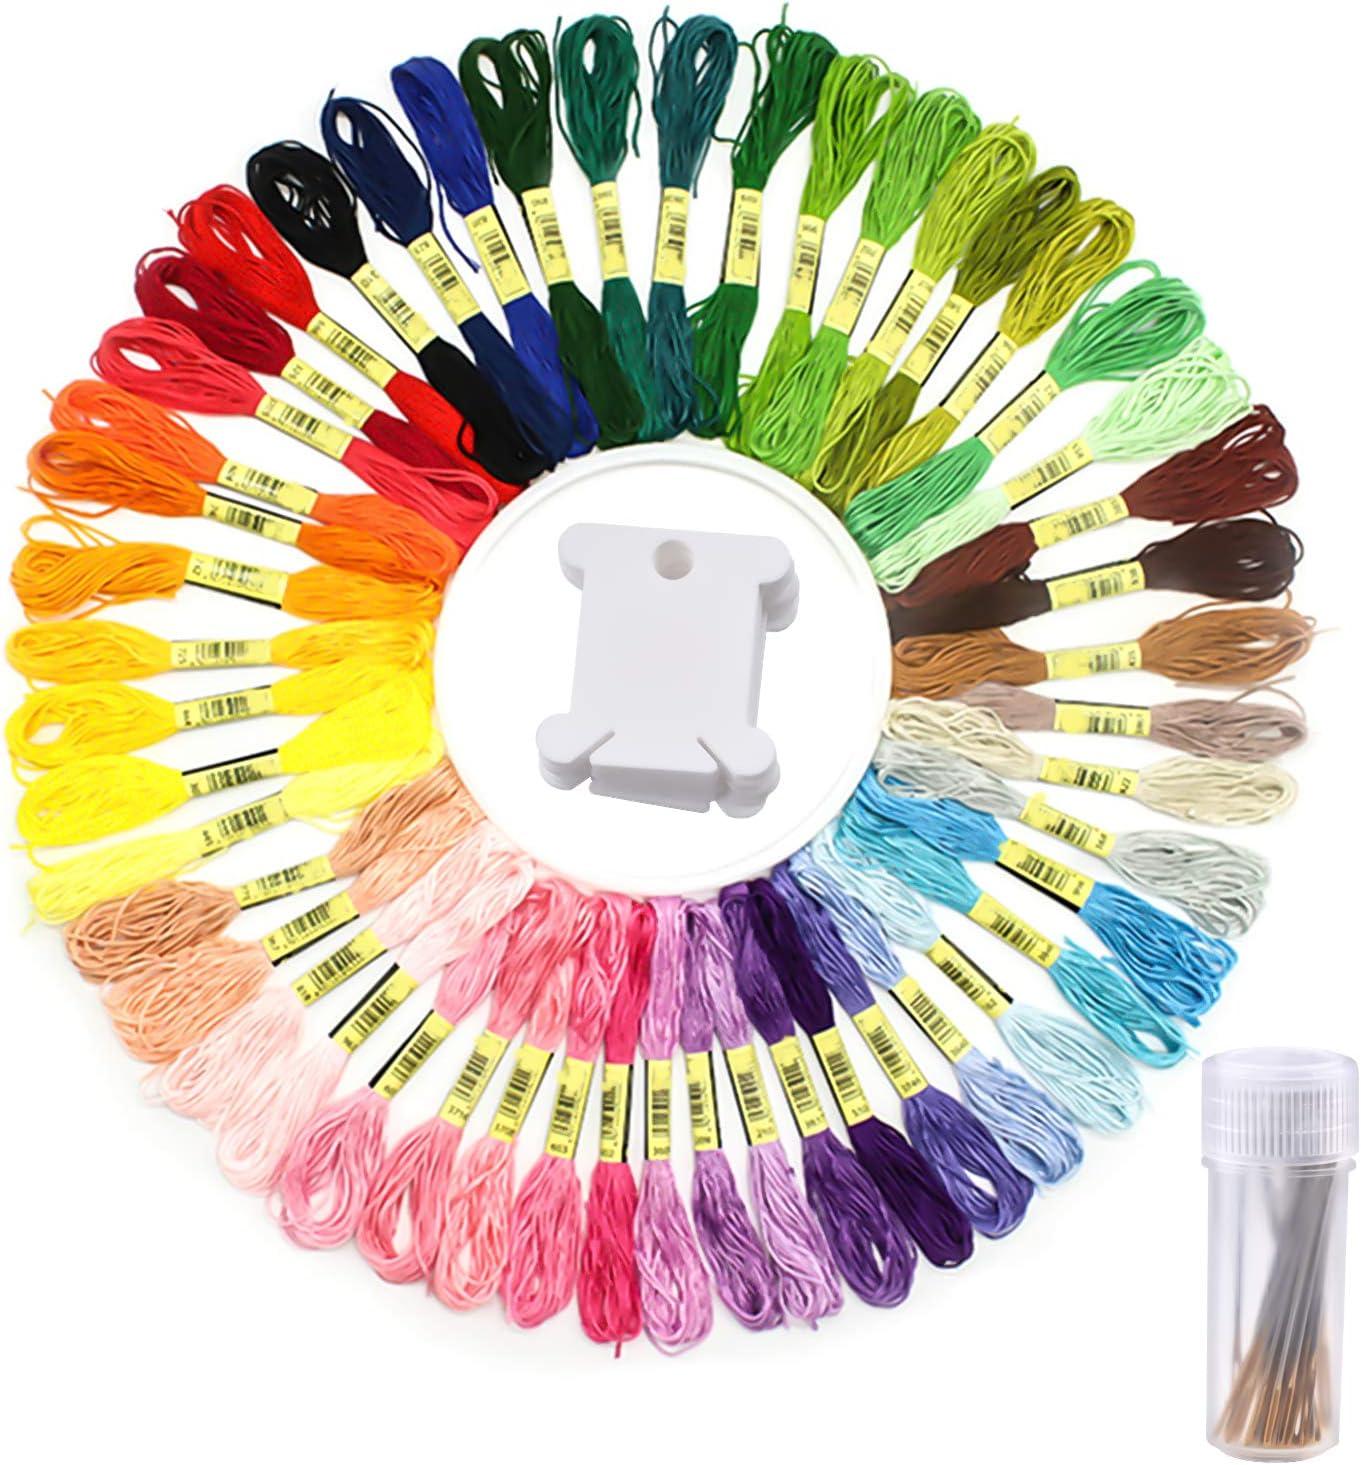 Outstanding Aylifu Embroidery Floss Set 50 Cross Color Sale item Skeins Rainbow Stitc